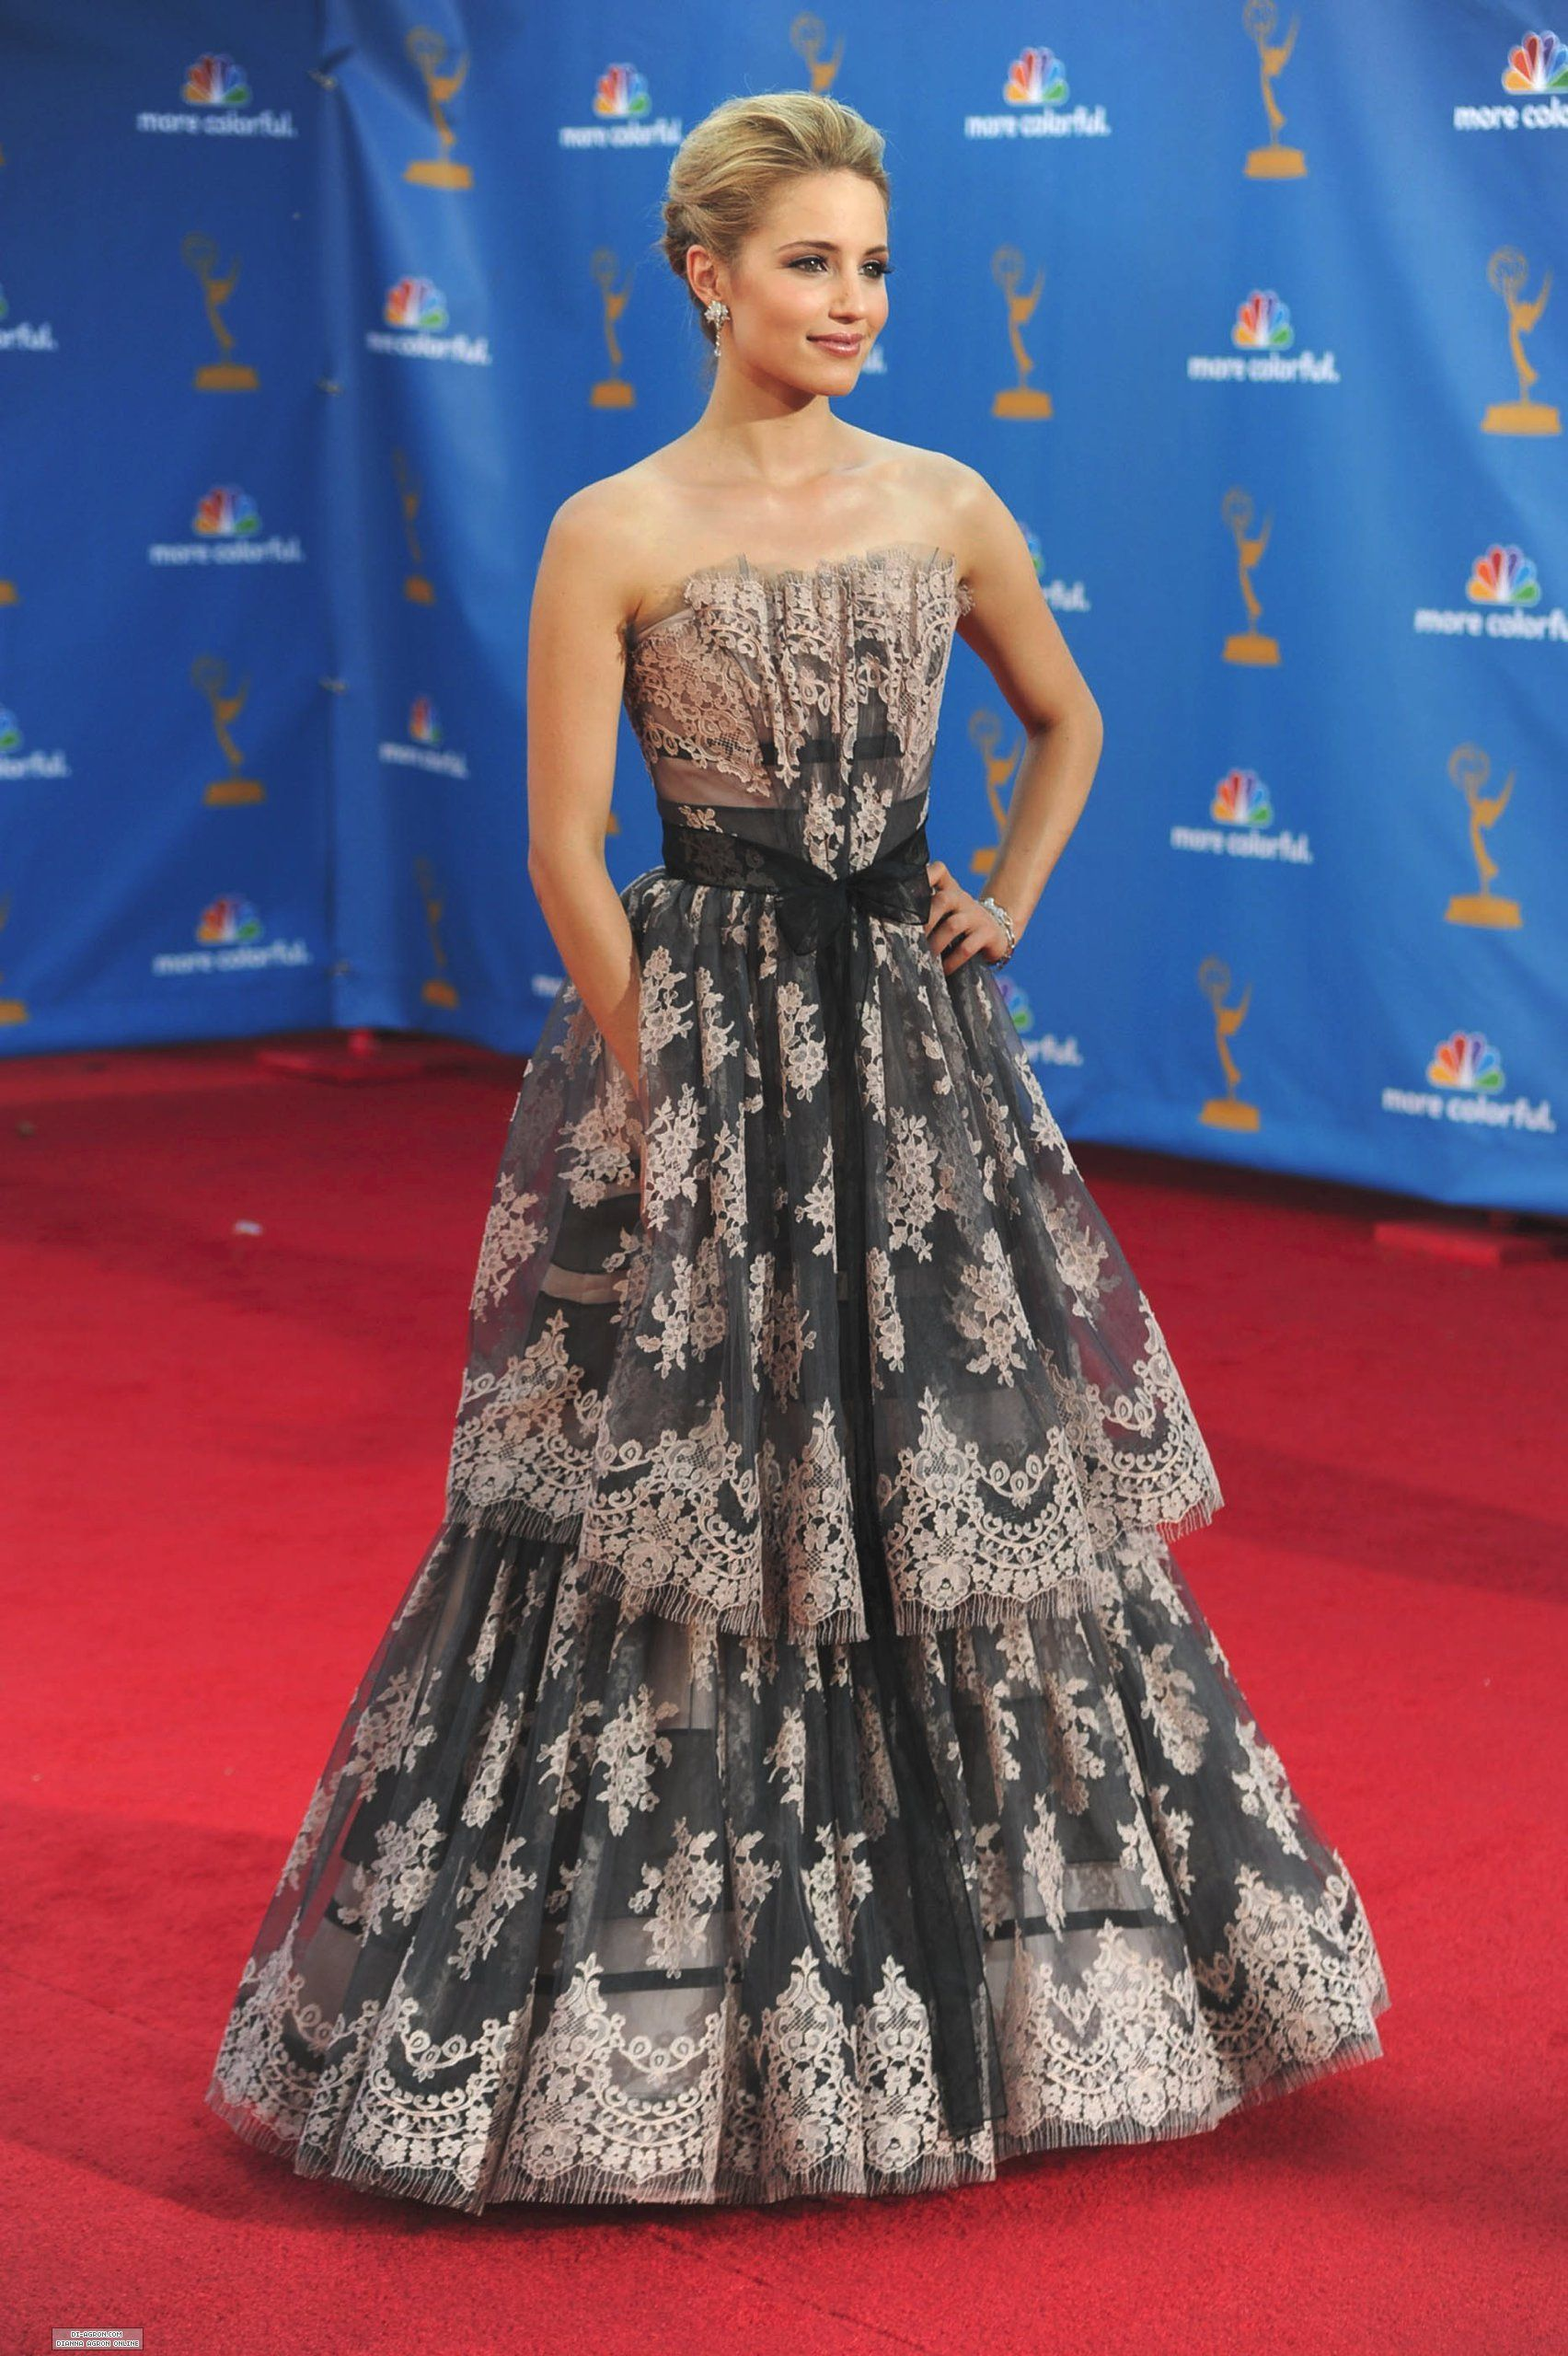 Dianna agron wedding dress  Dianna Agron  Emmyus   Celebrity Style   Pinterest